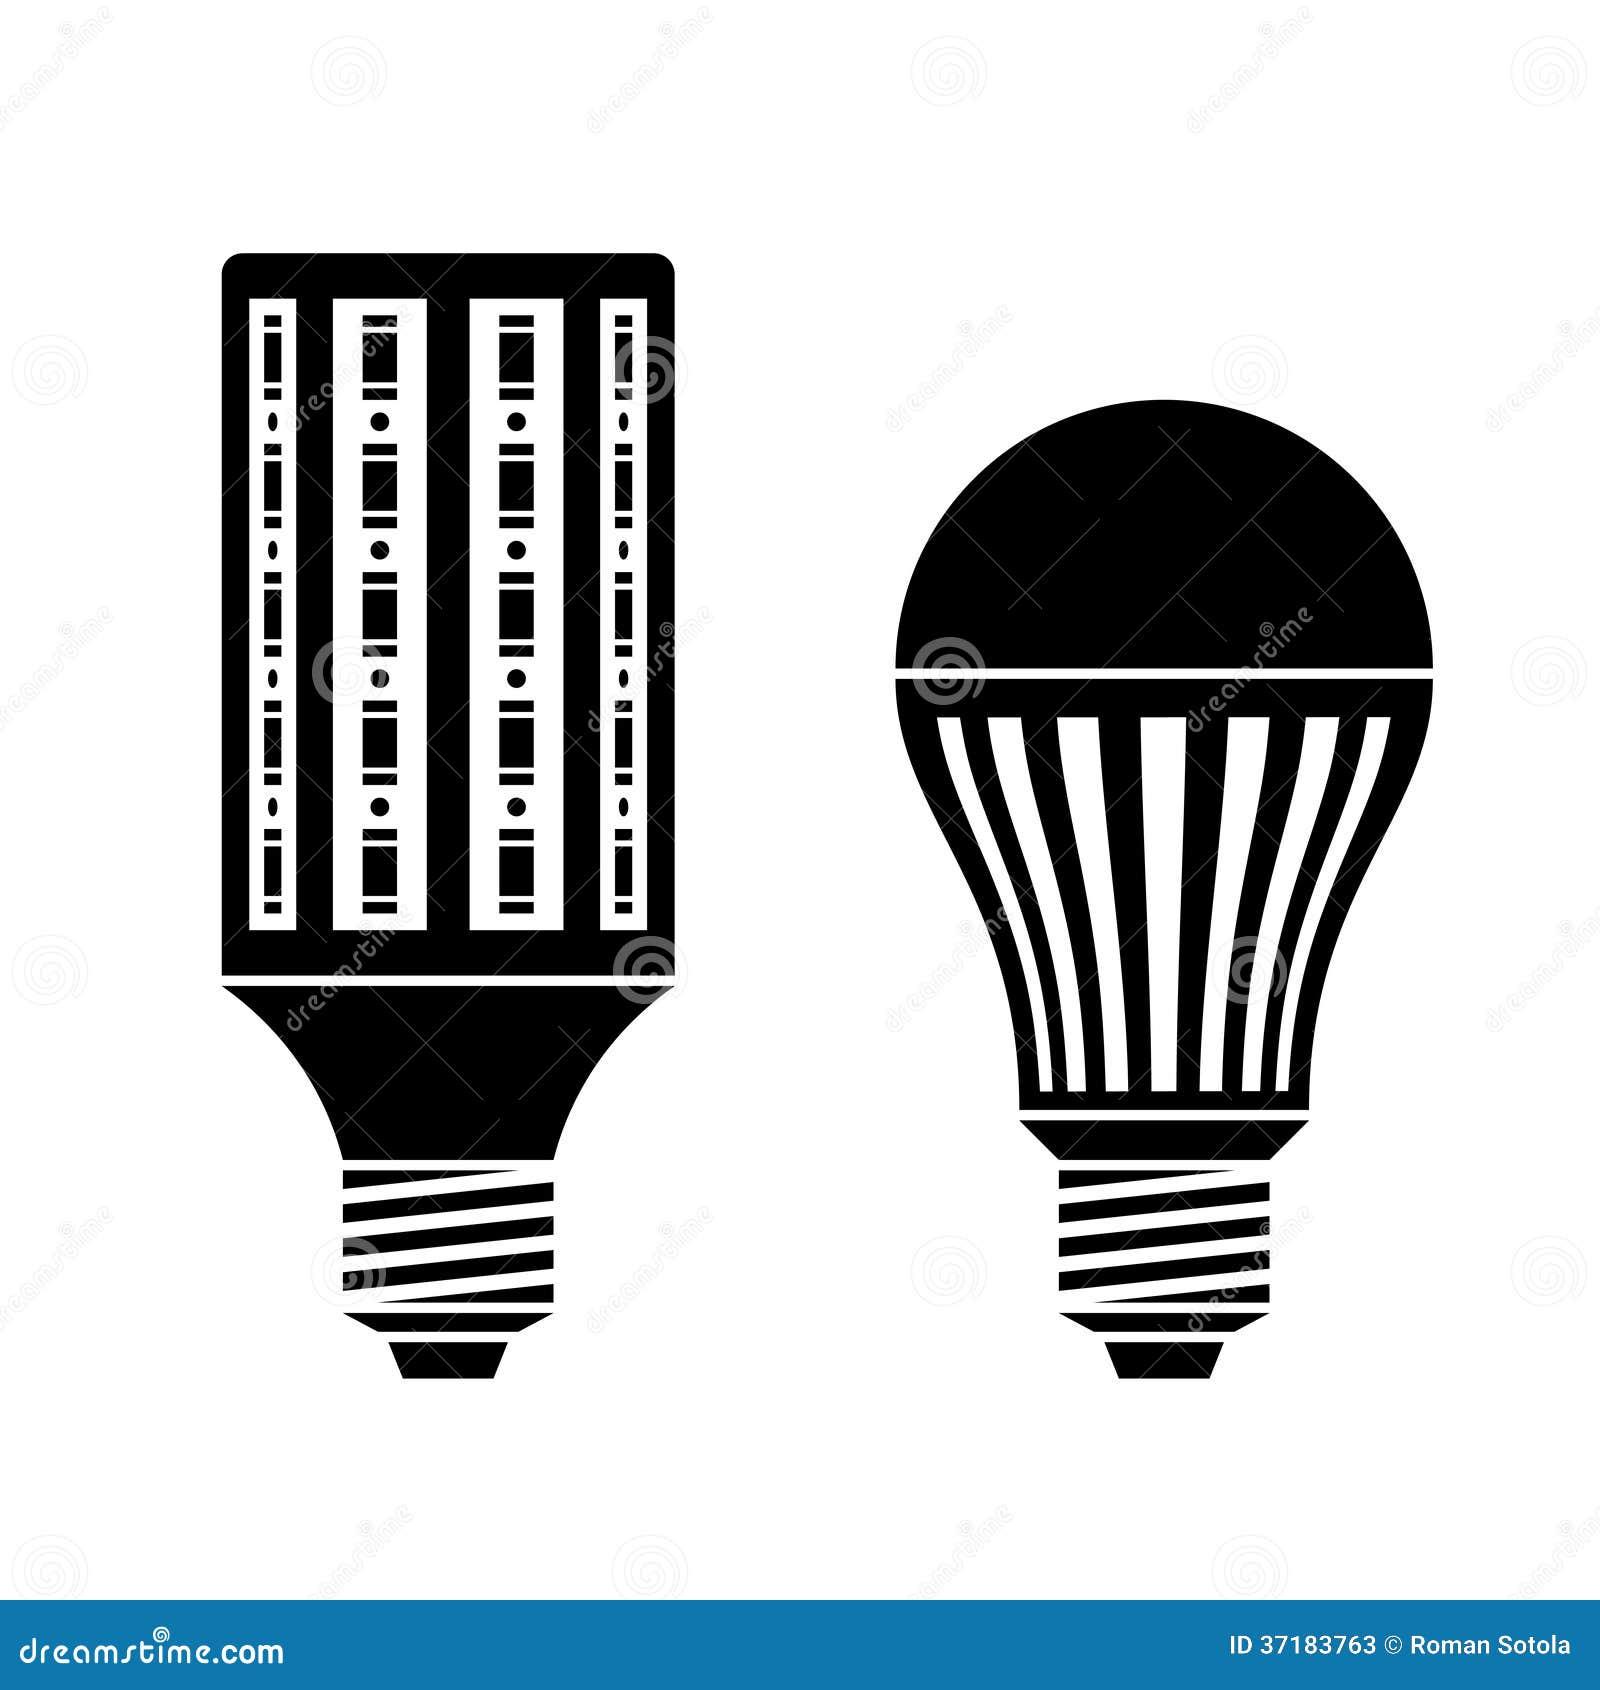 LED Energy Saving Lamp Bulb Symbols Stock Vector - Illustration of ...